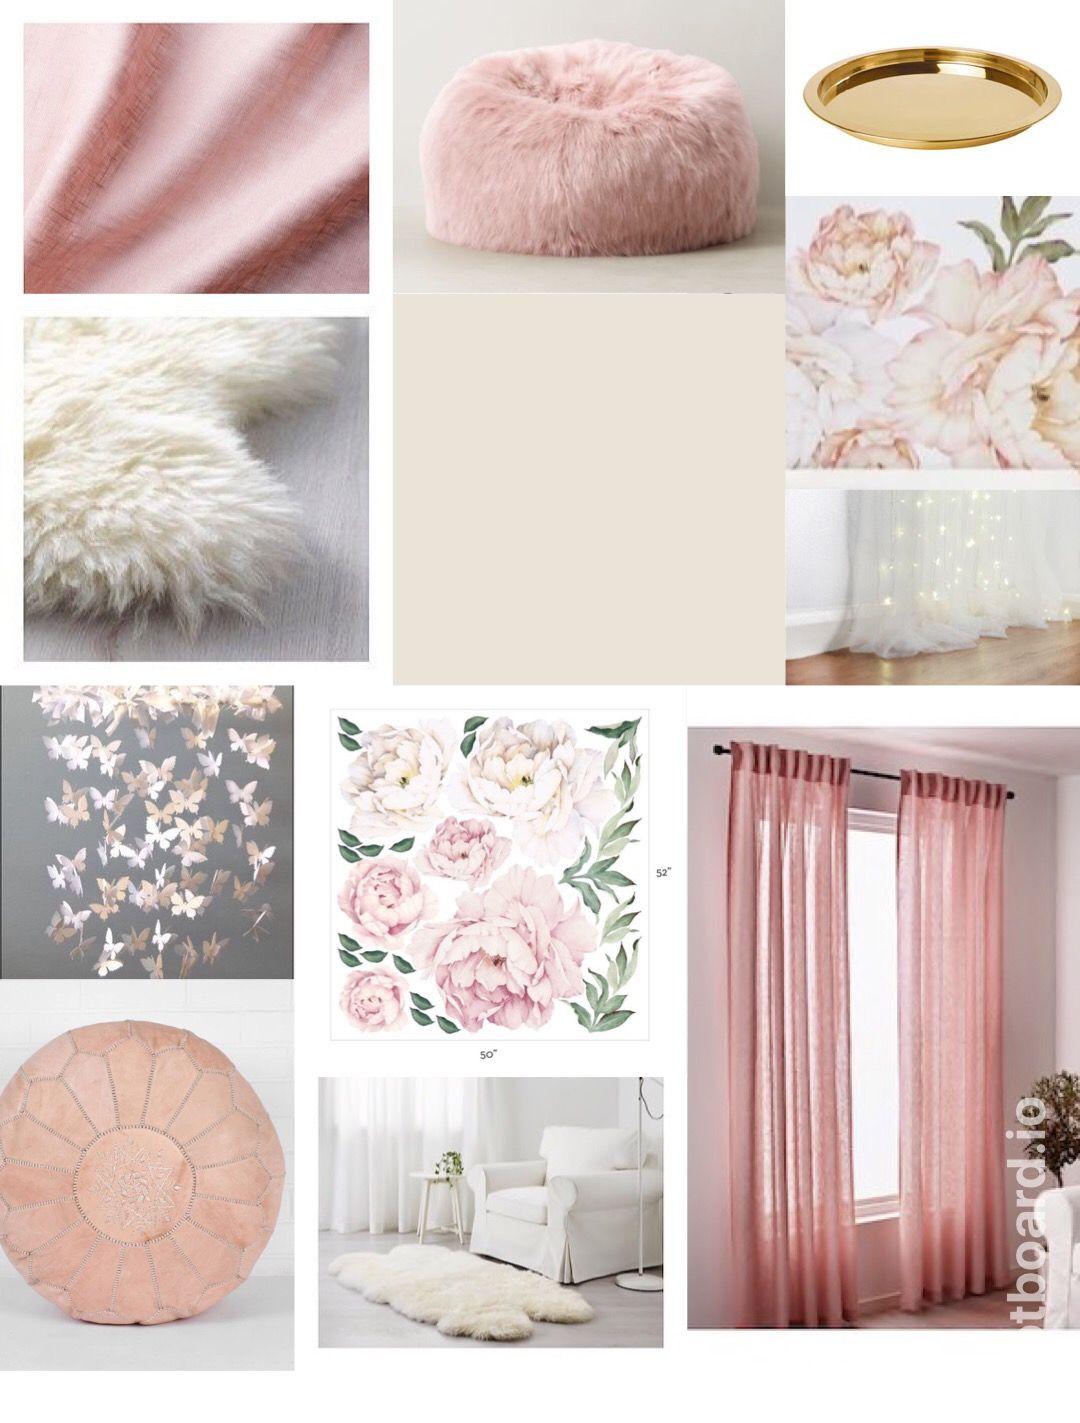 White Rose Gold And Blush Pink Nursery Mood Board Gold Baby Room Blush Pink Nursery Rose Gold Room Decor